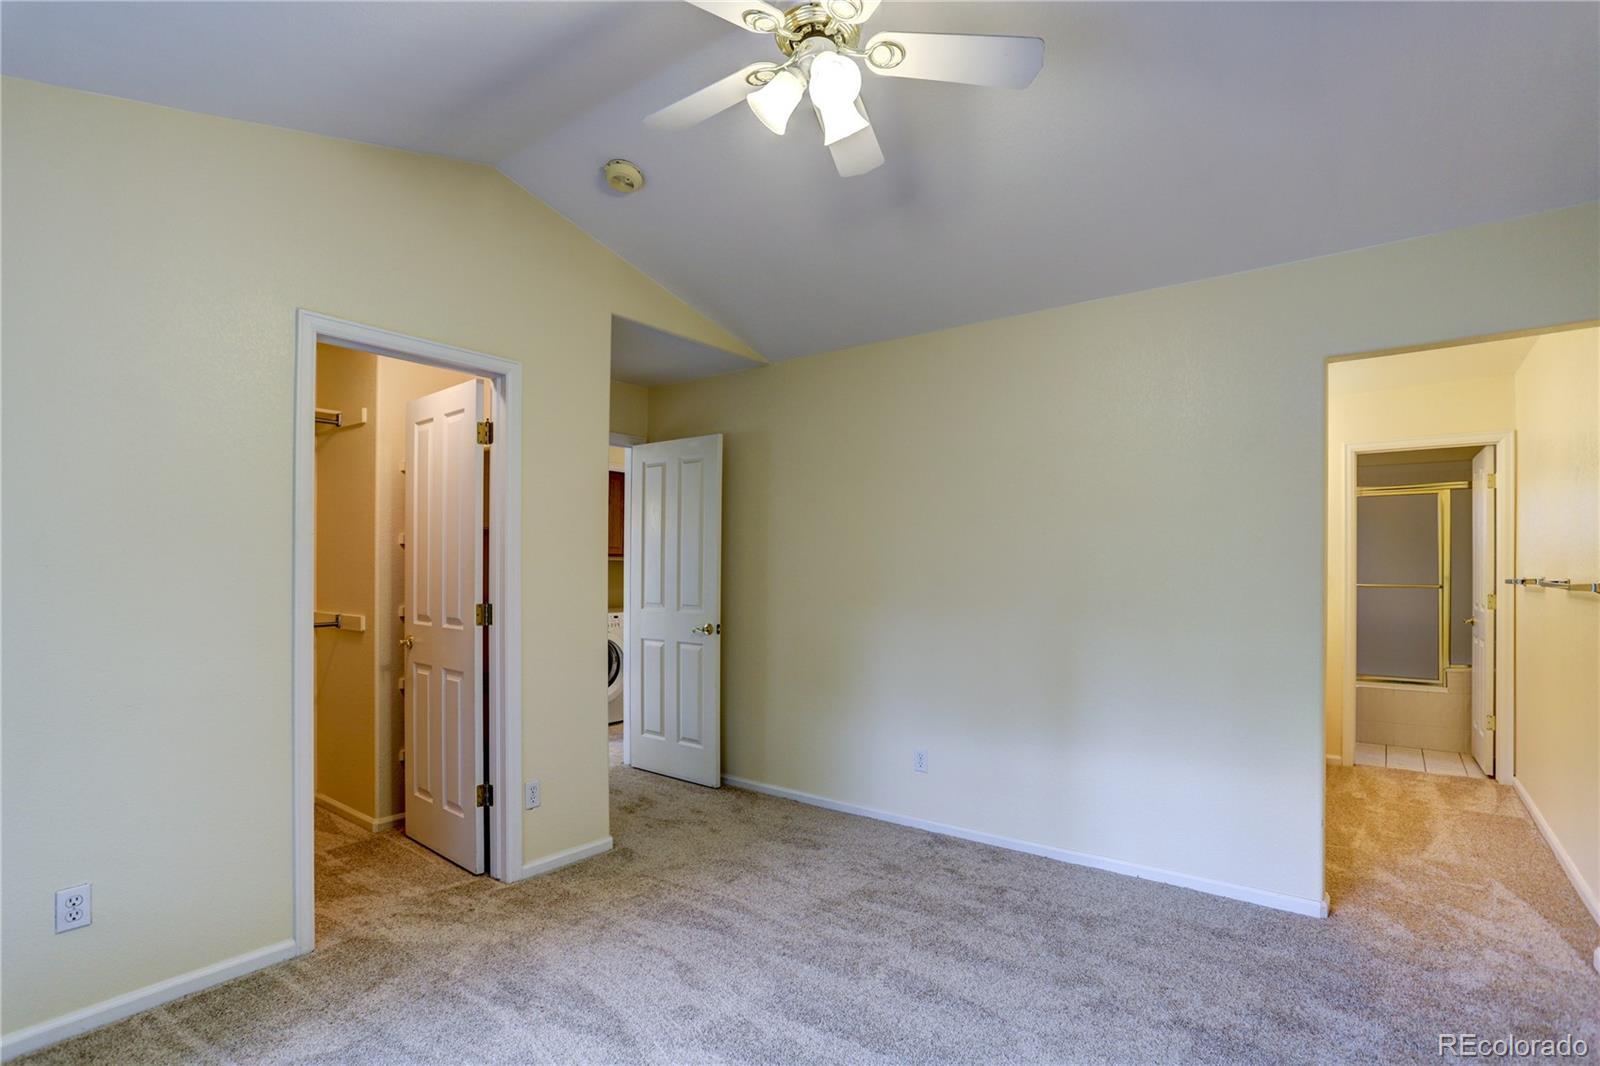 MLS# 2836182 - 27 - 7700 W Grant Ranch Boulevard #10D, Littleton, CO 80123